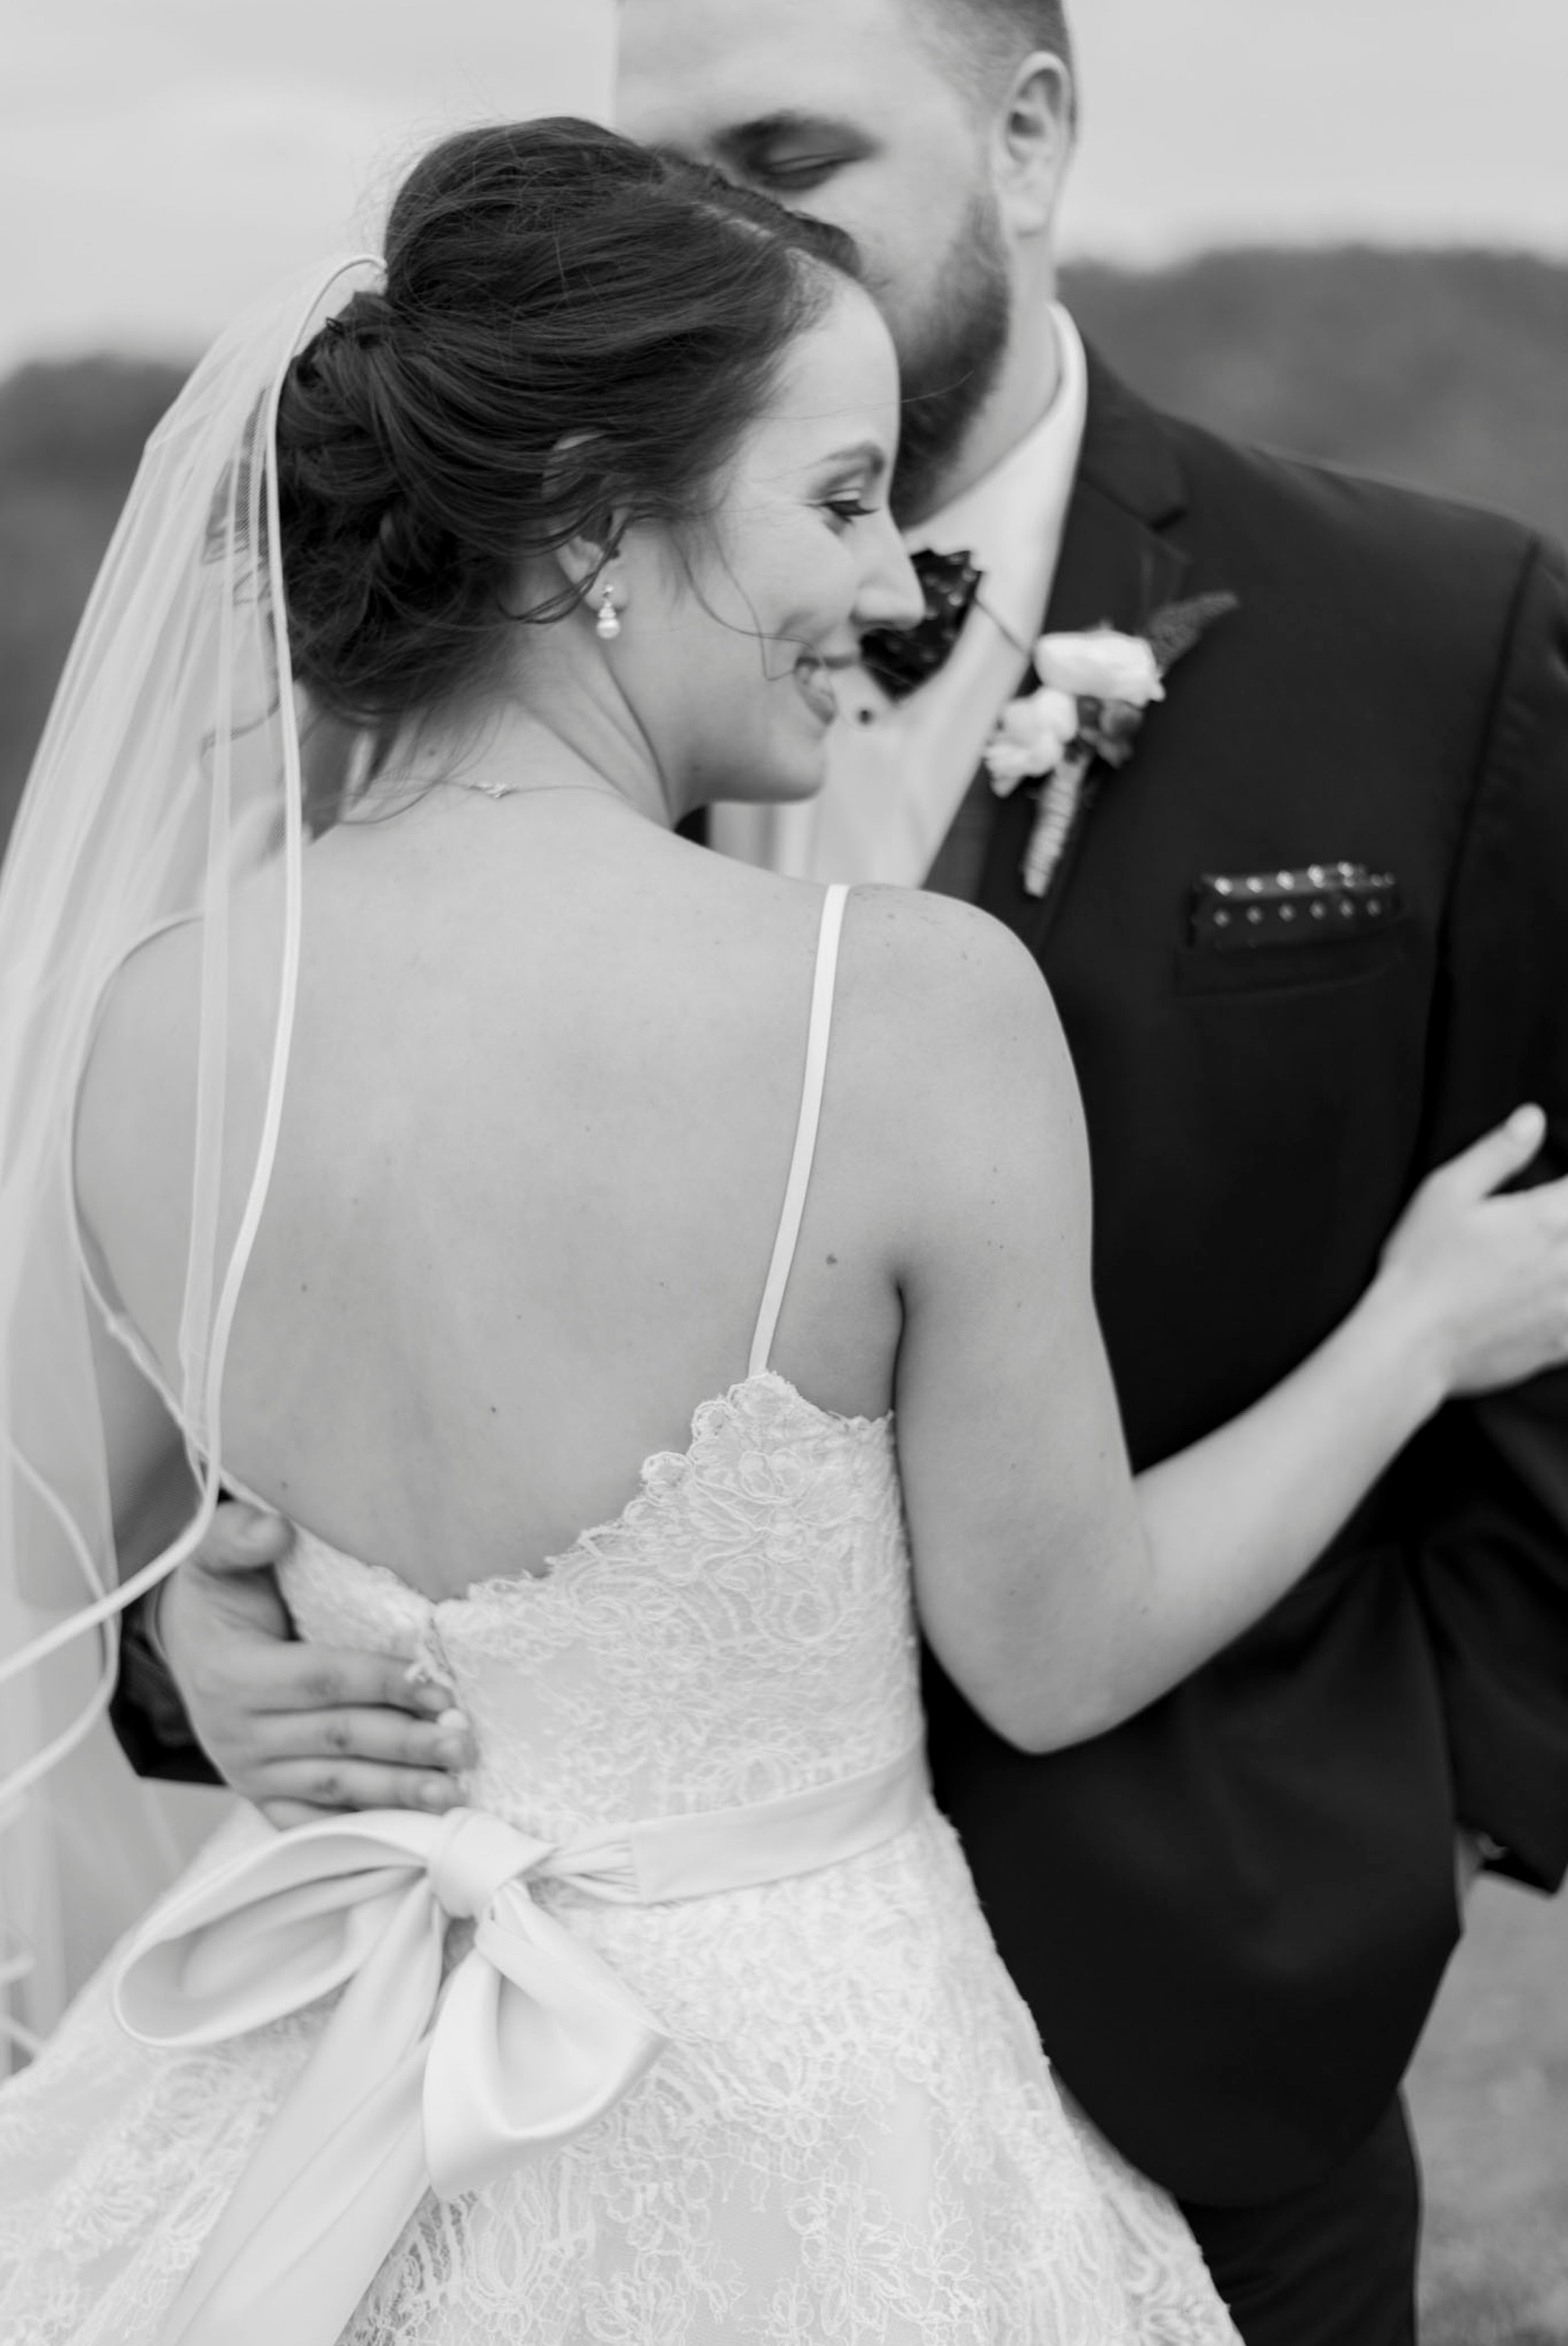 IrvineEstate_LexingtonVA_Wedding_FallWedding_VirginiaWeddingPhotographer 91.jpg